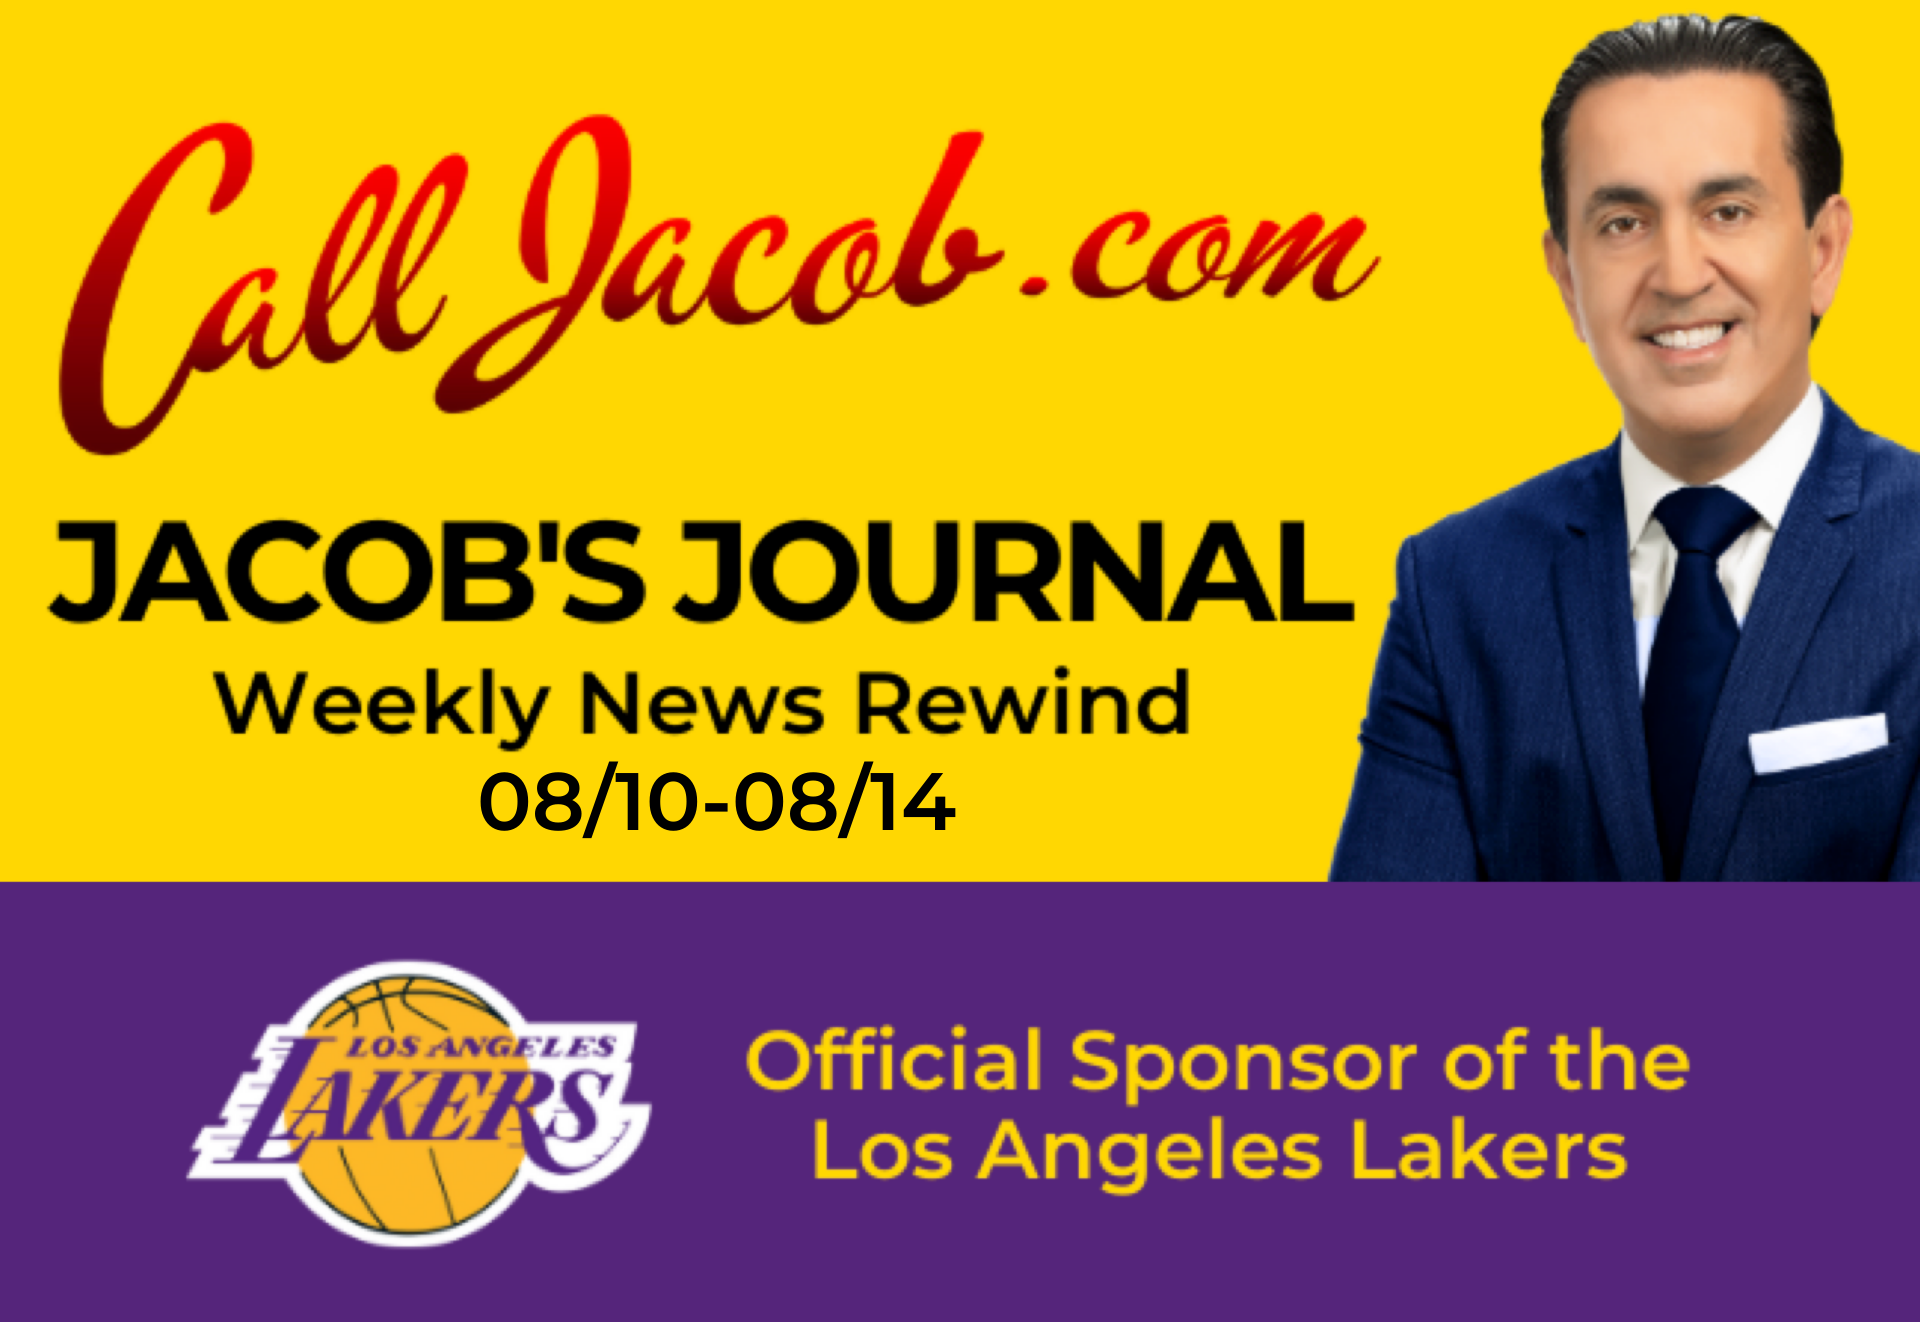 JacobsJournalWeeklyNewsRewind-08_10-08_14